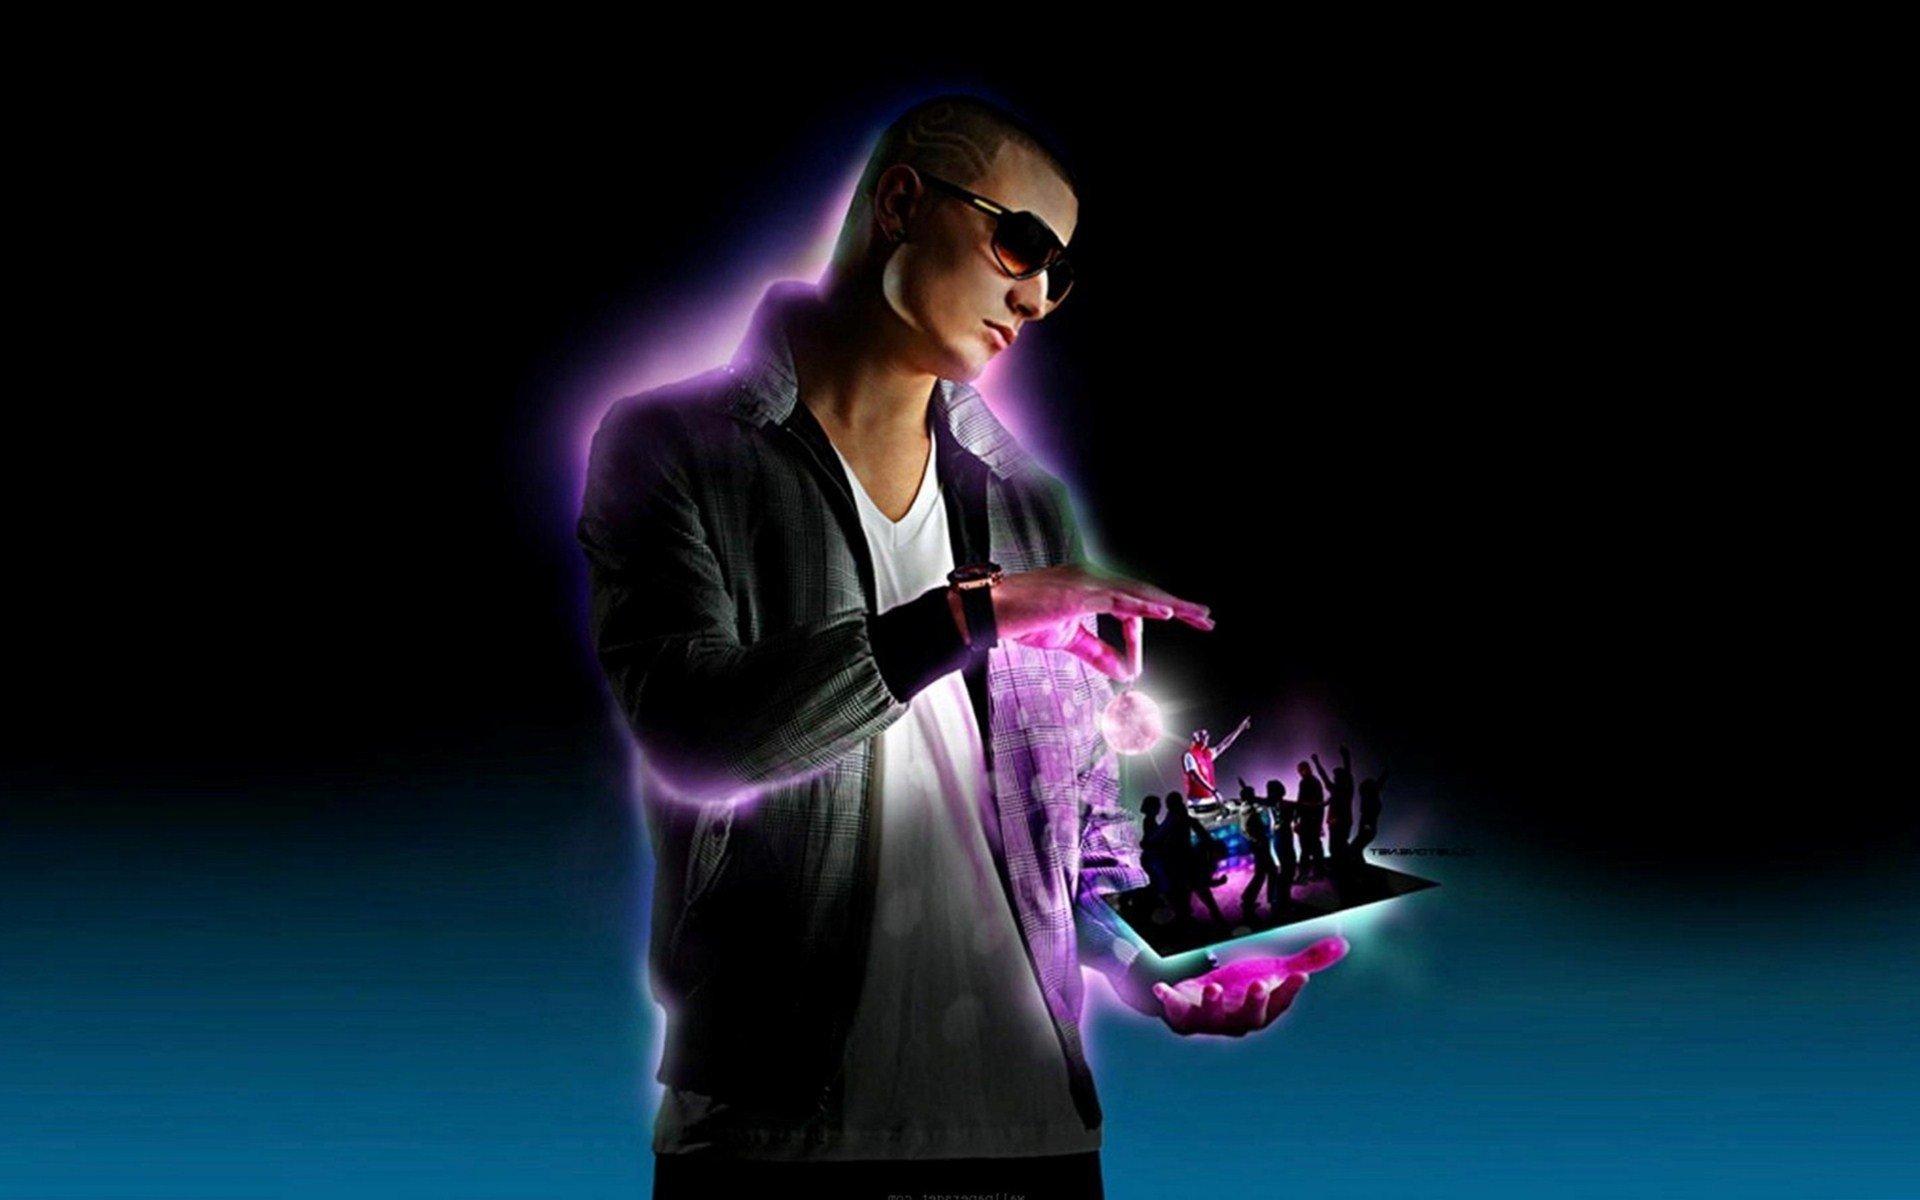 DJ Snake Pictures